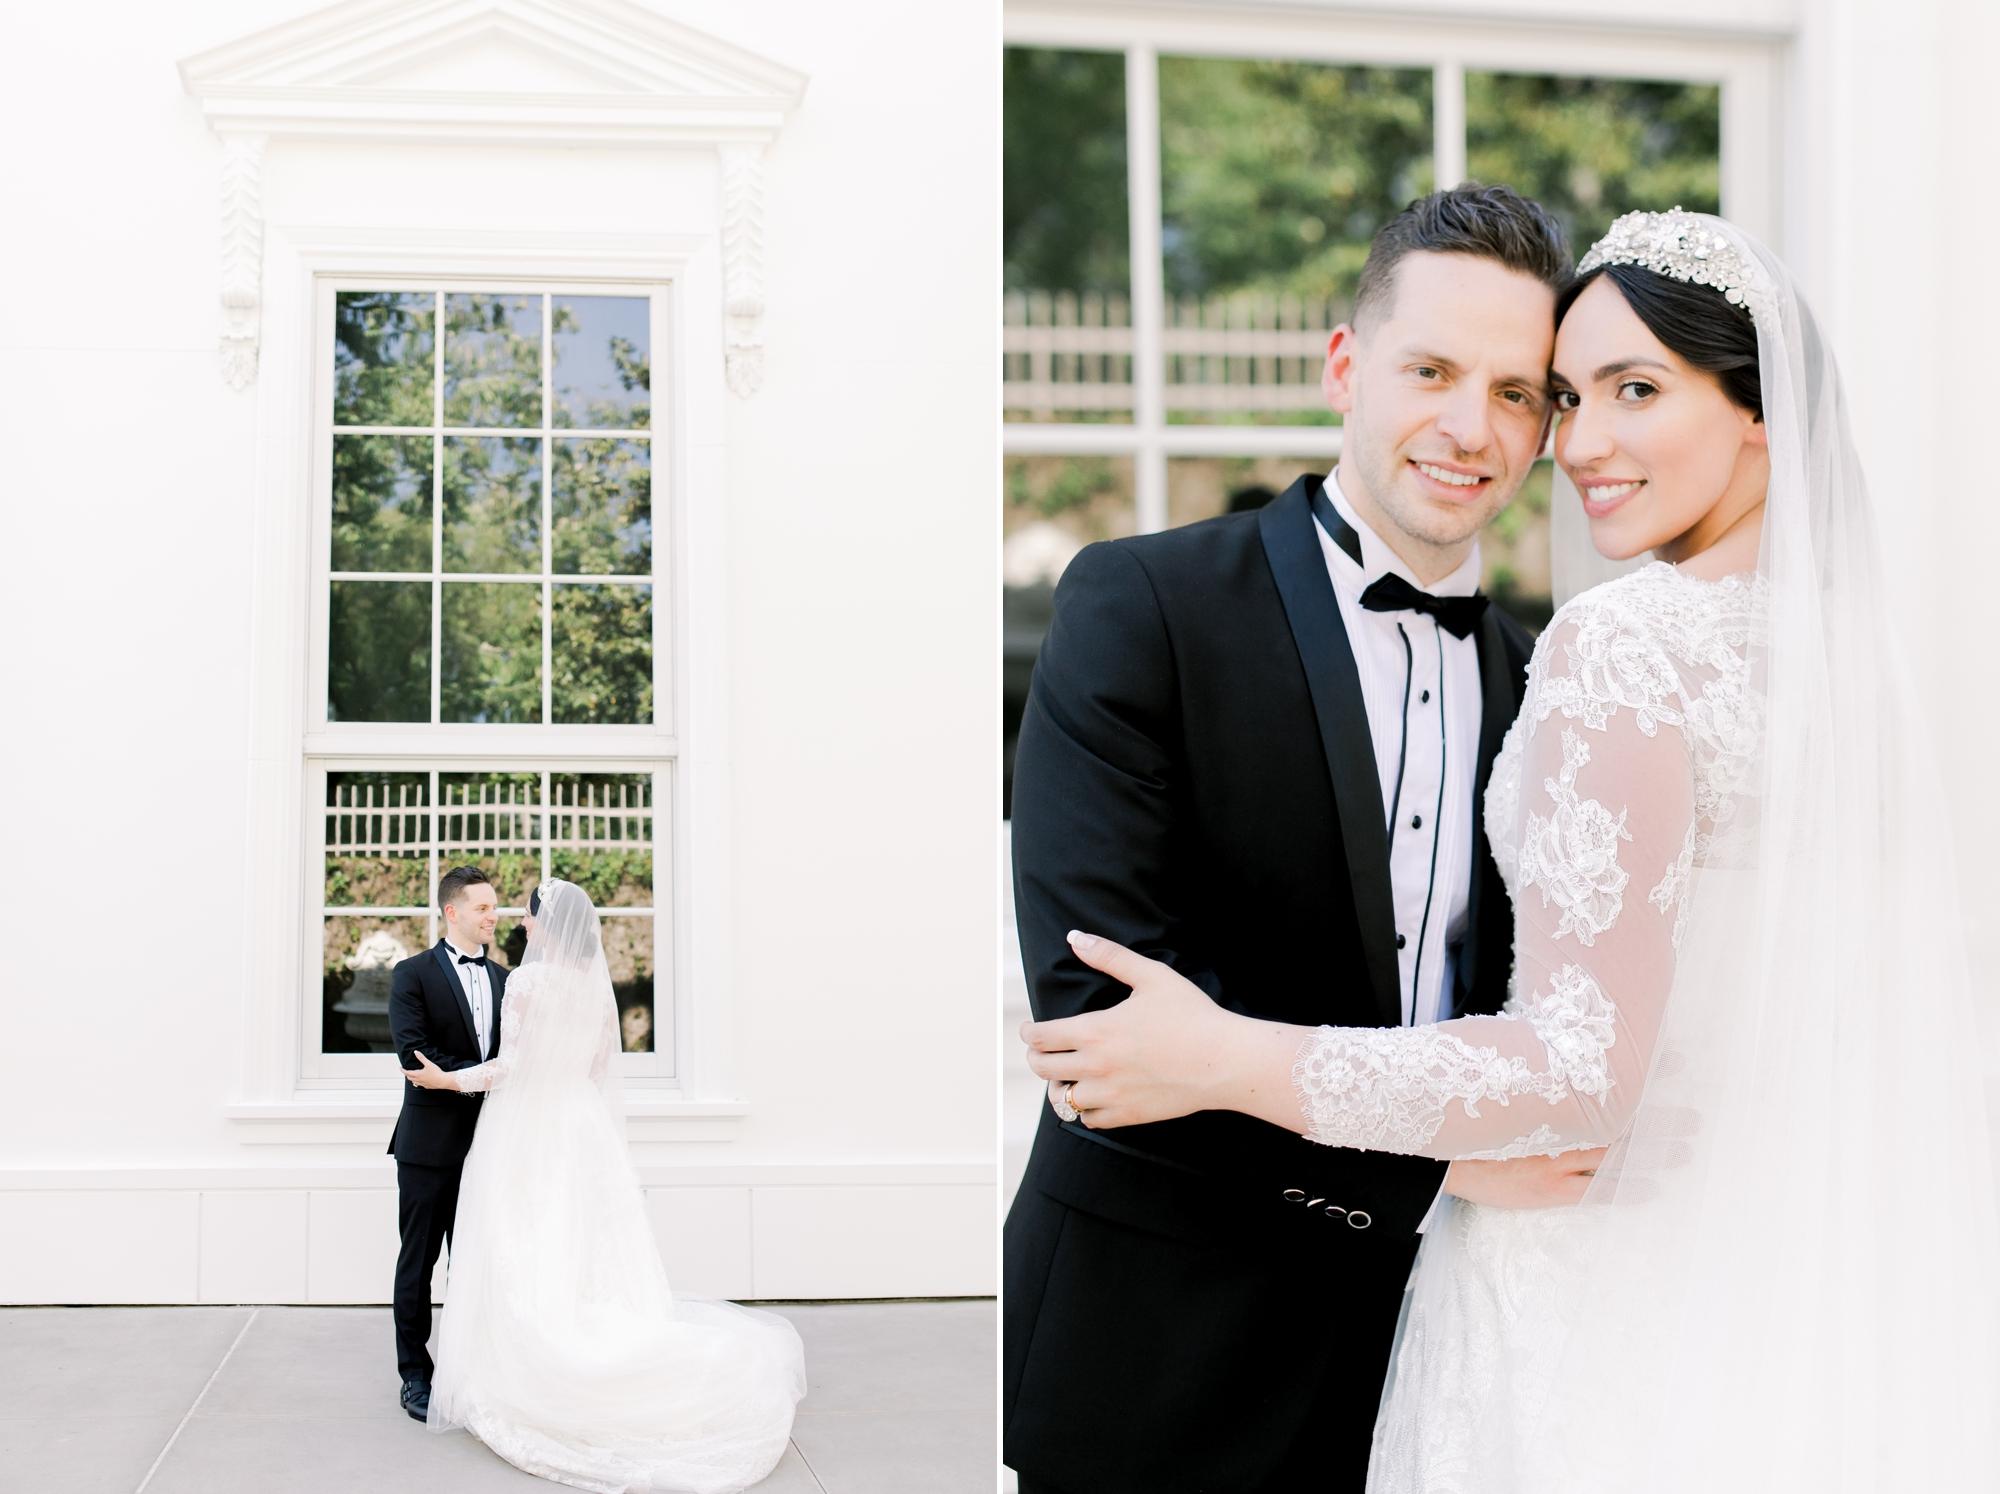 ROYAL-WEDDING-RICHARD-NIXON-LIBRARY 5.jpg